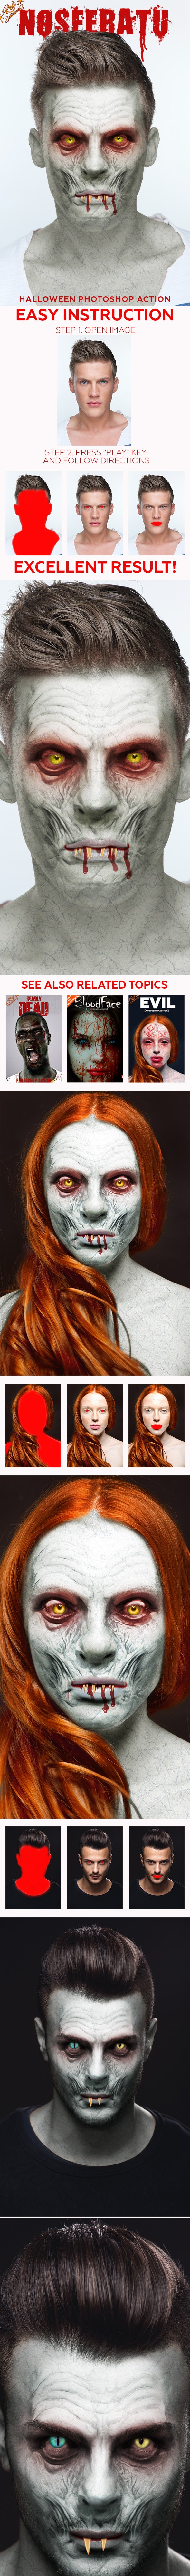 Nosferatu Photoshop Action - Photo Effects Actions